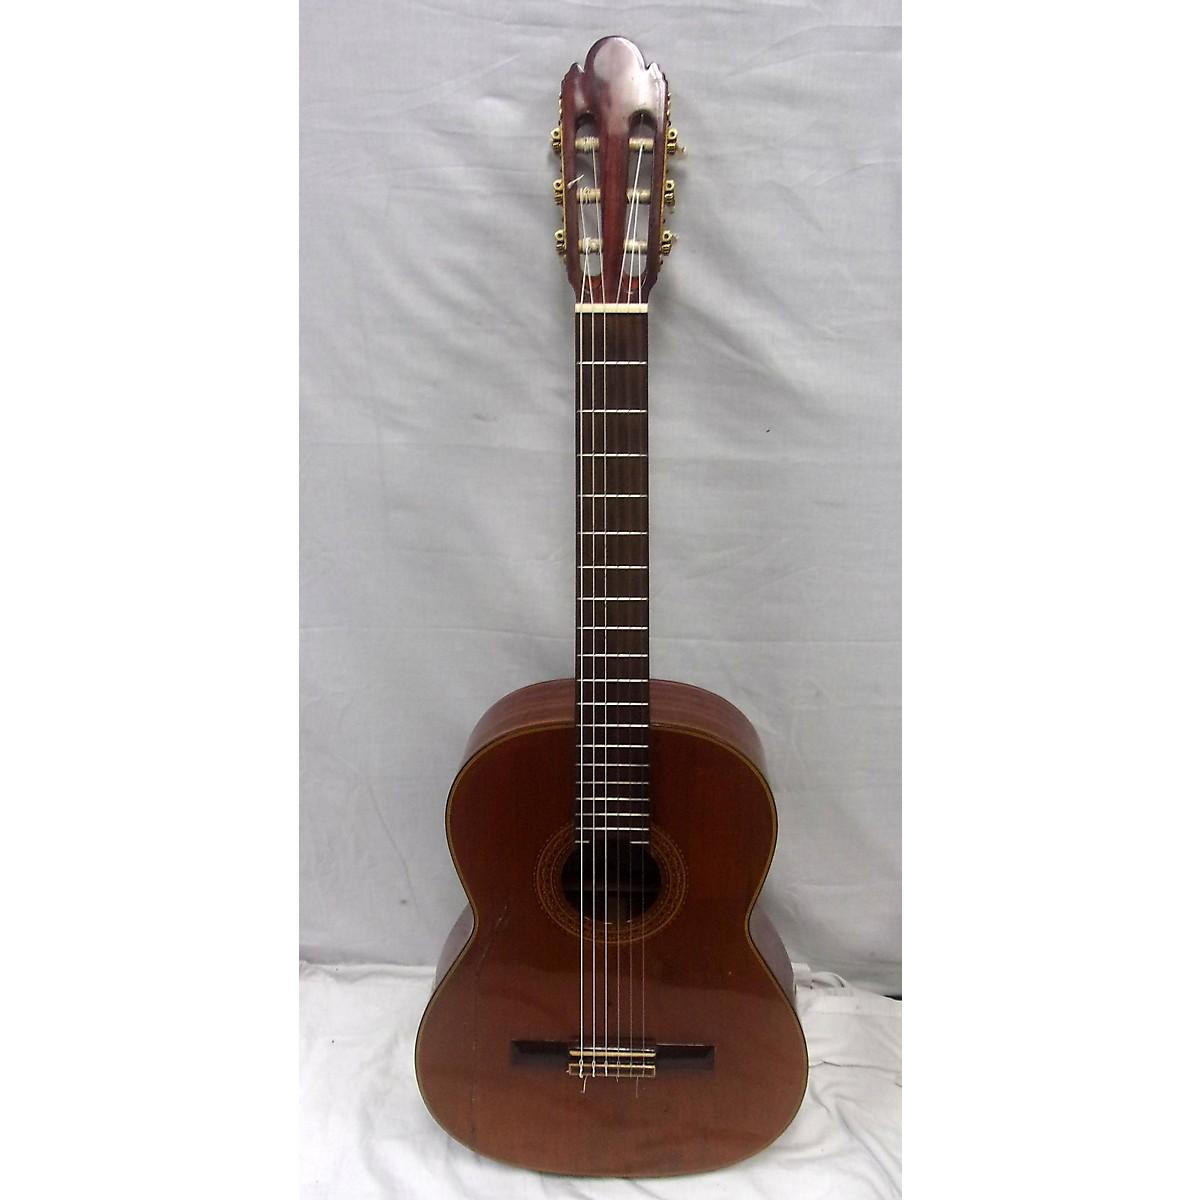 In Store Vintage Vintage 1970 SHOICHI YANAGISAWA Antique Natural Classical Acoustic Guitar